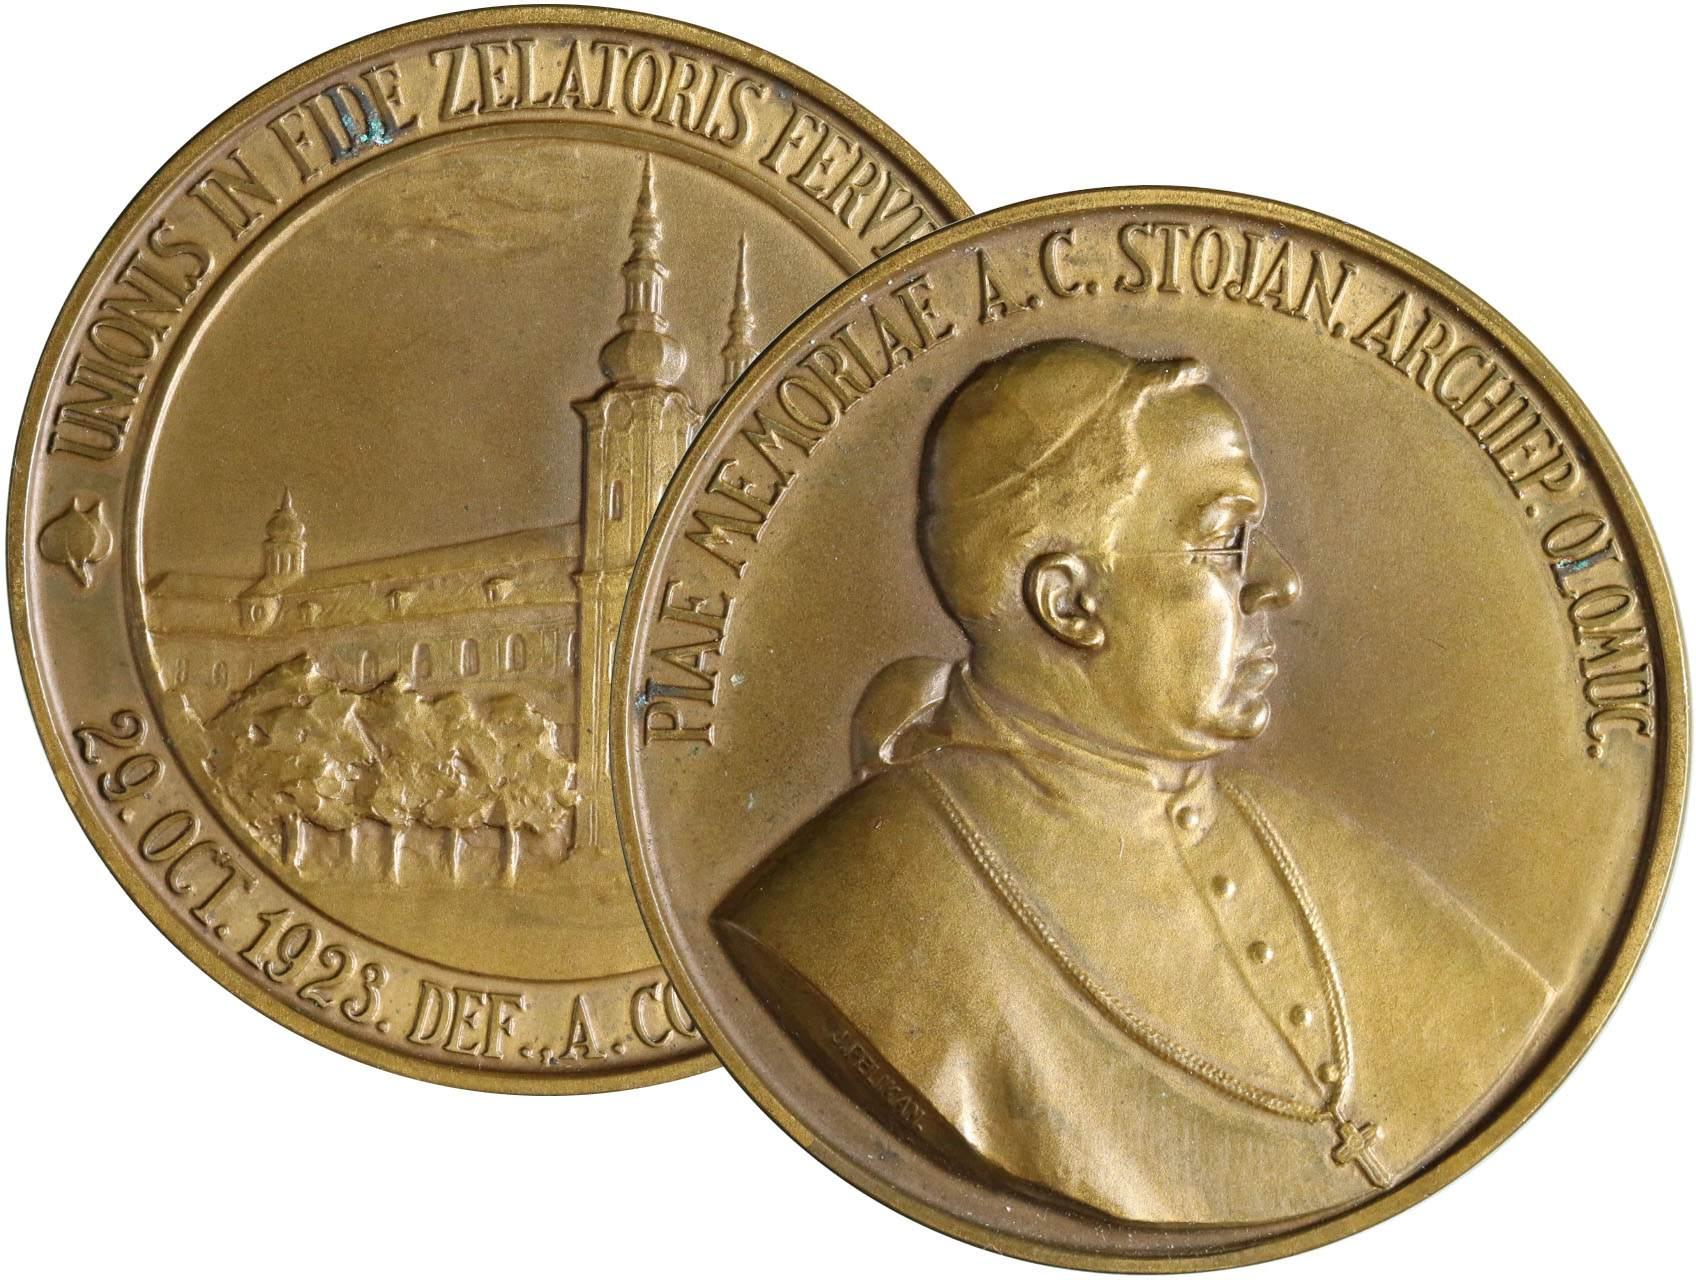 Pelikán Julius 1887-1969 - AE Medaile 1923 úmrtní. Poprsí Antonína Cyrila Stojana zleva, opis / Pohled na klášter, opis. Bronz 50 mm